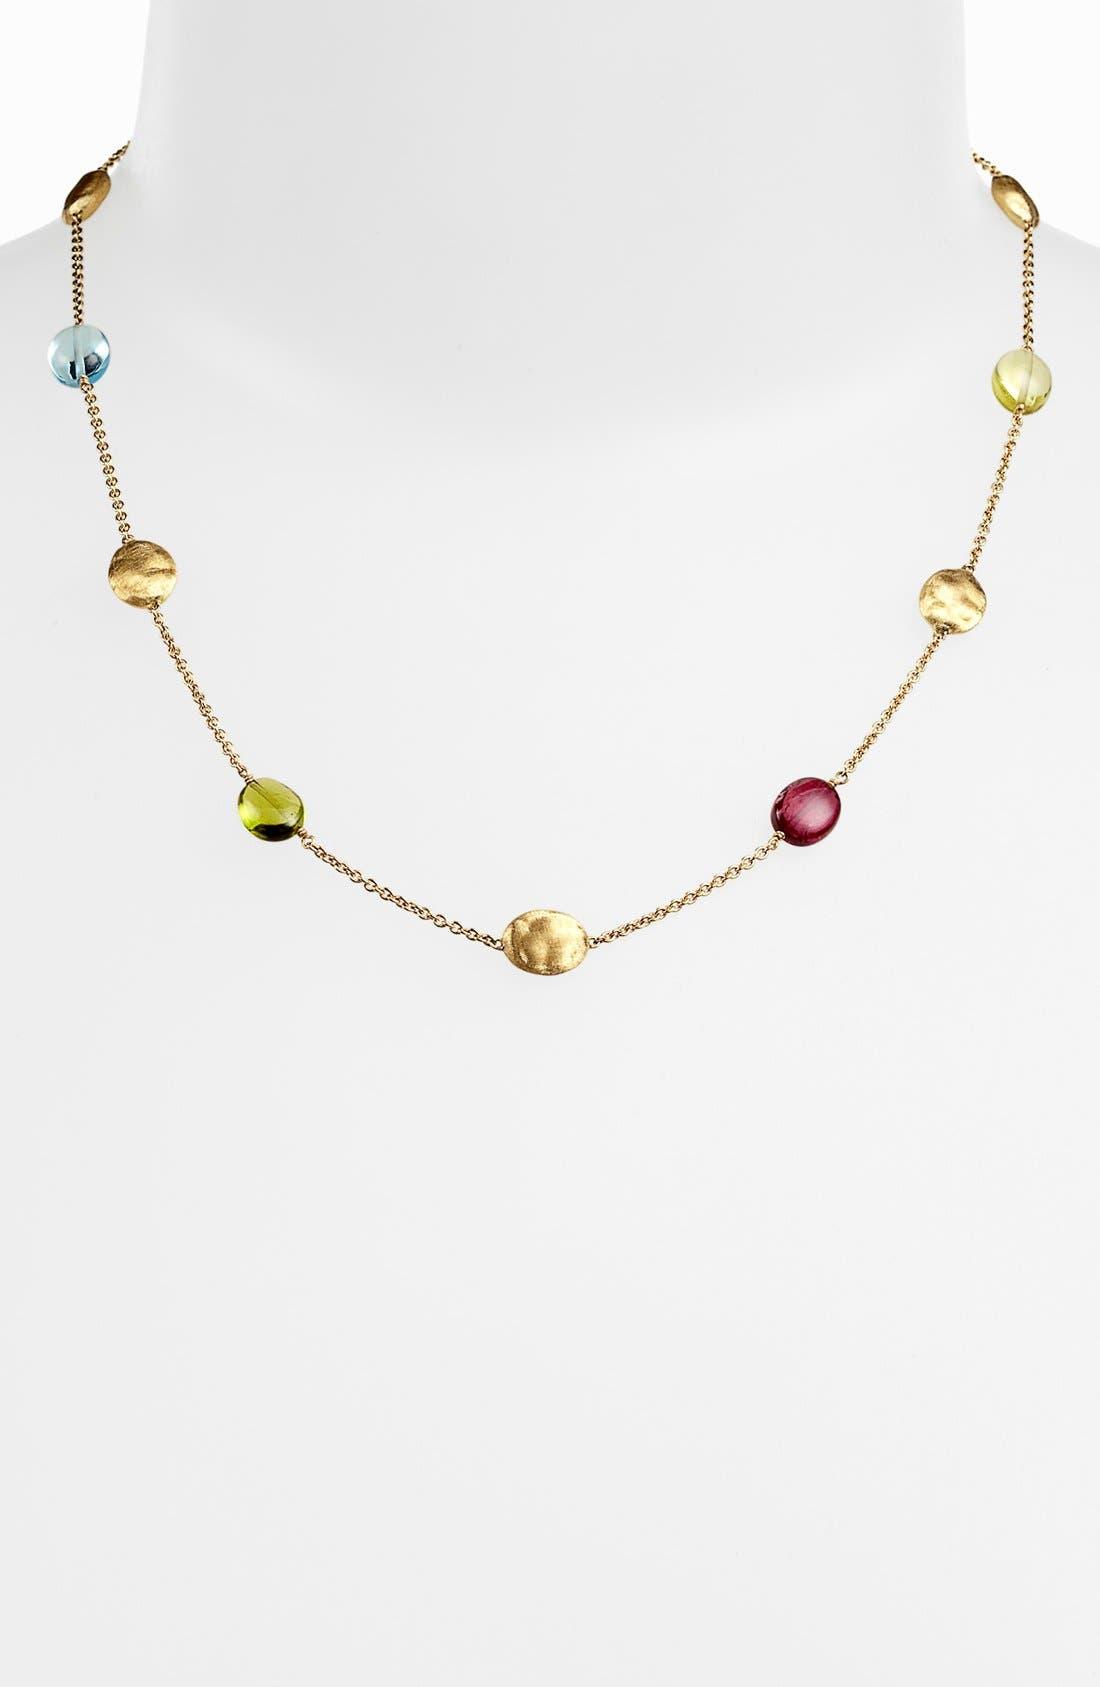 Alternate Image 1 Selected - Marco Bicego 'Siviglia' Semiprecious Station Necklace